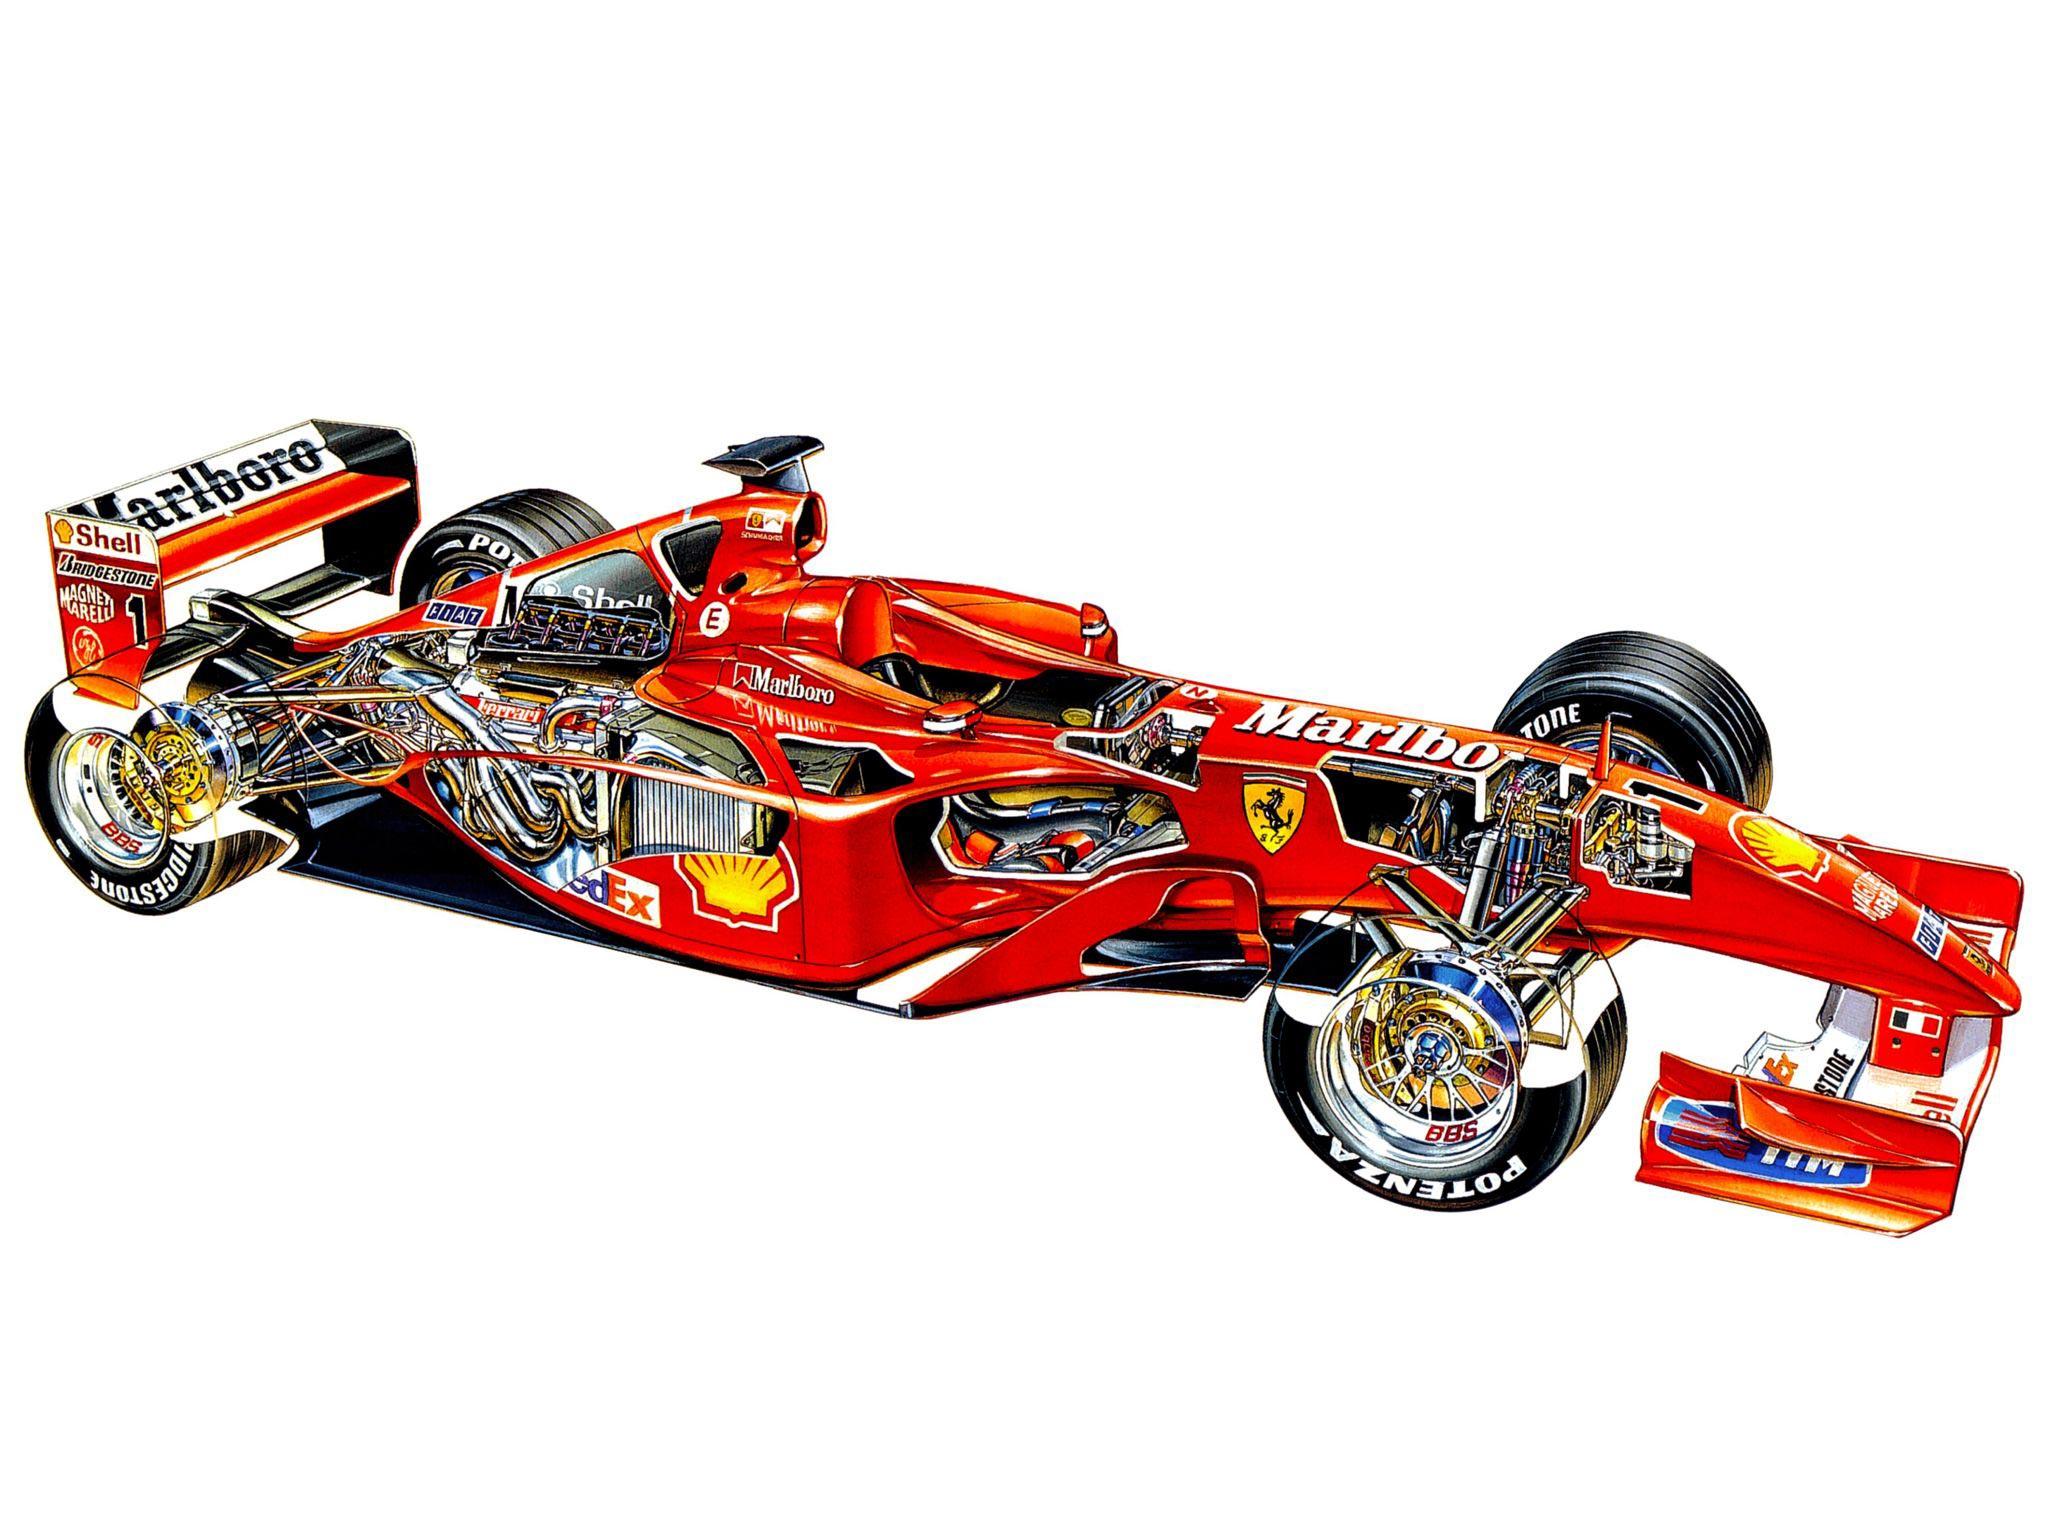 Ferrari F2001 cutaway drawing